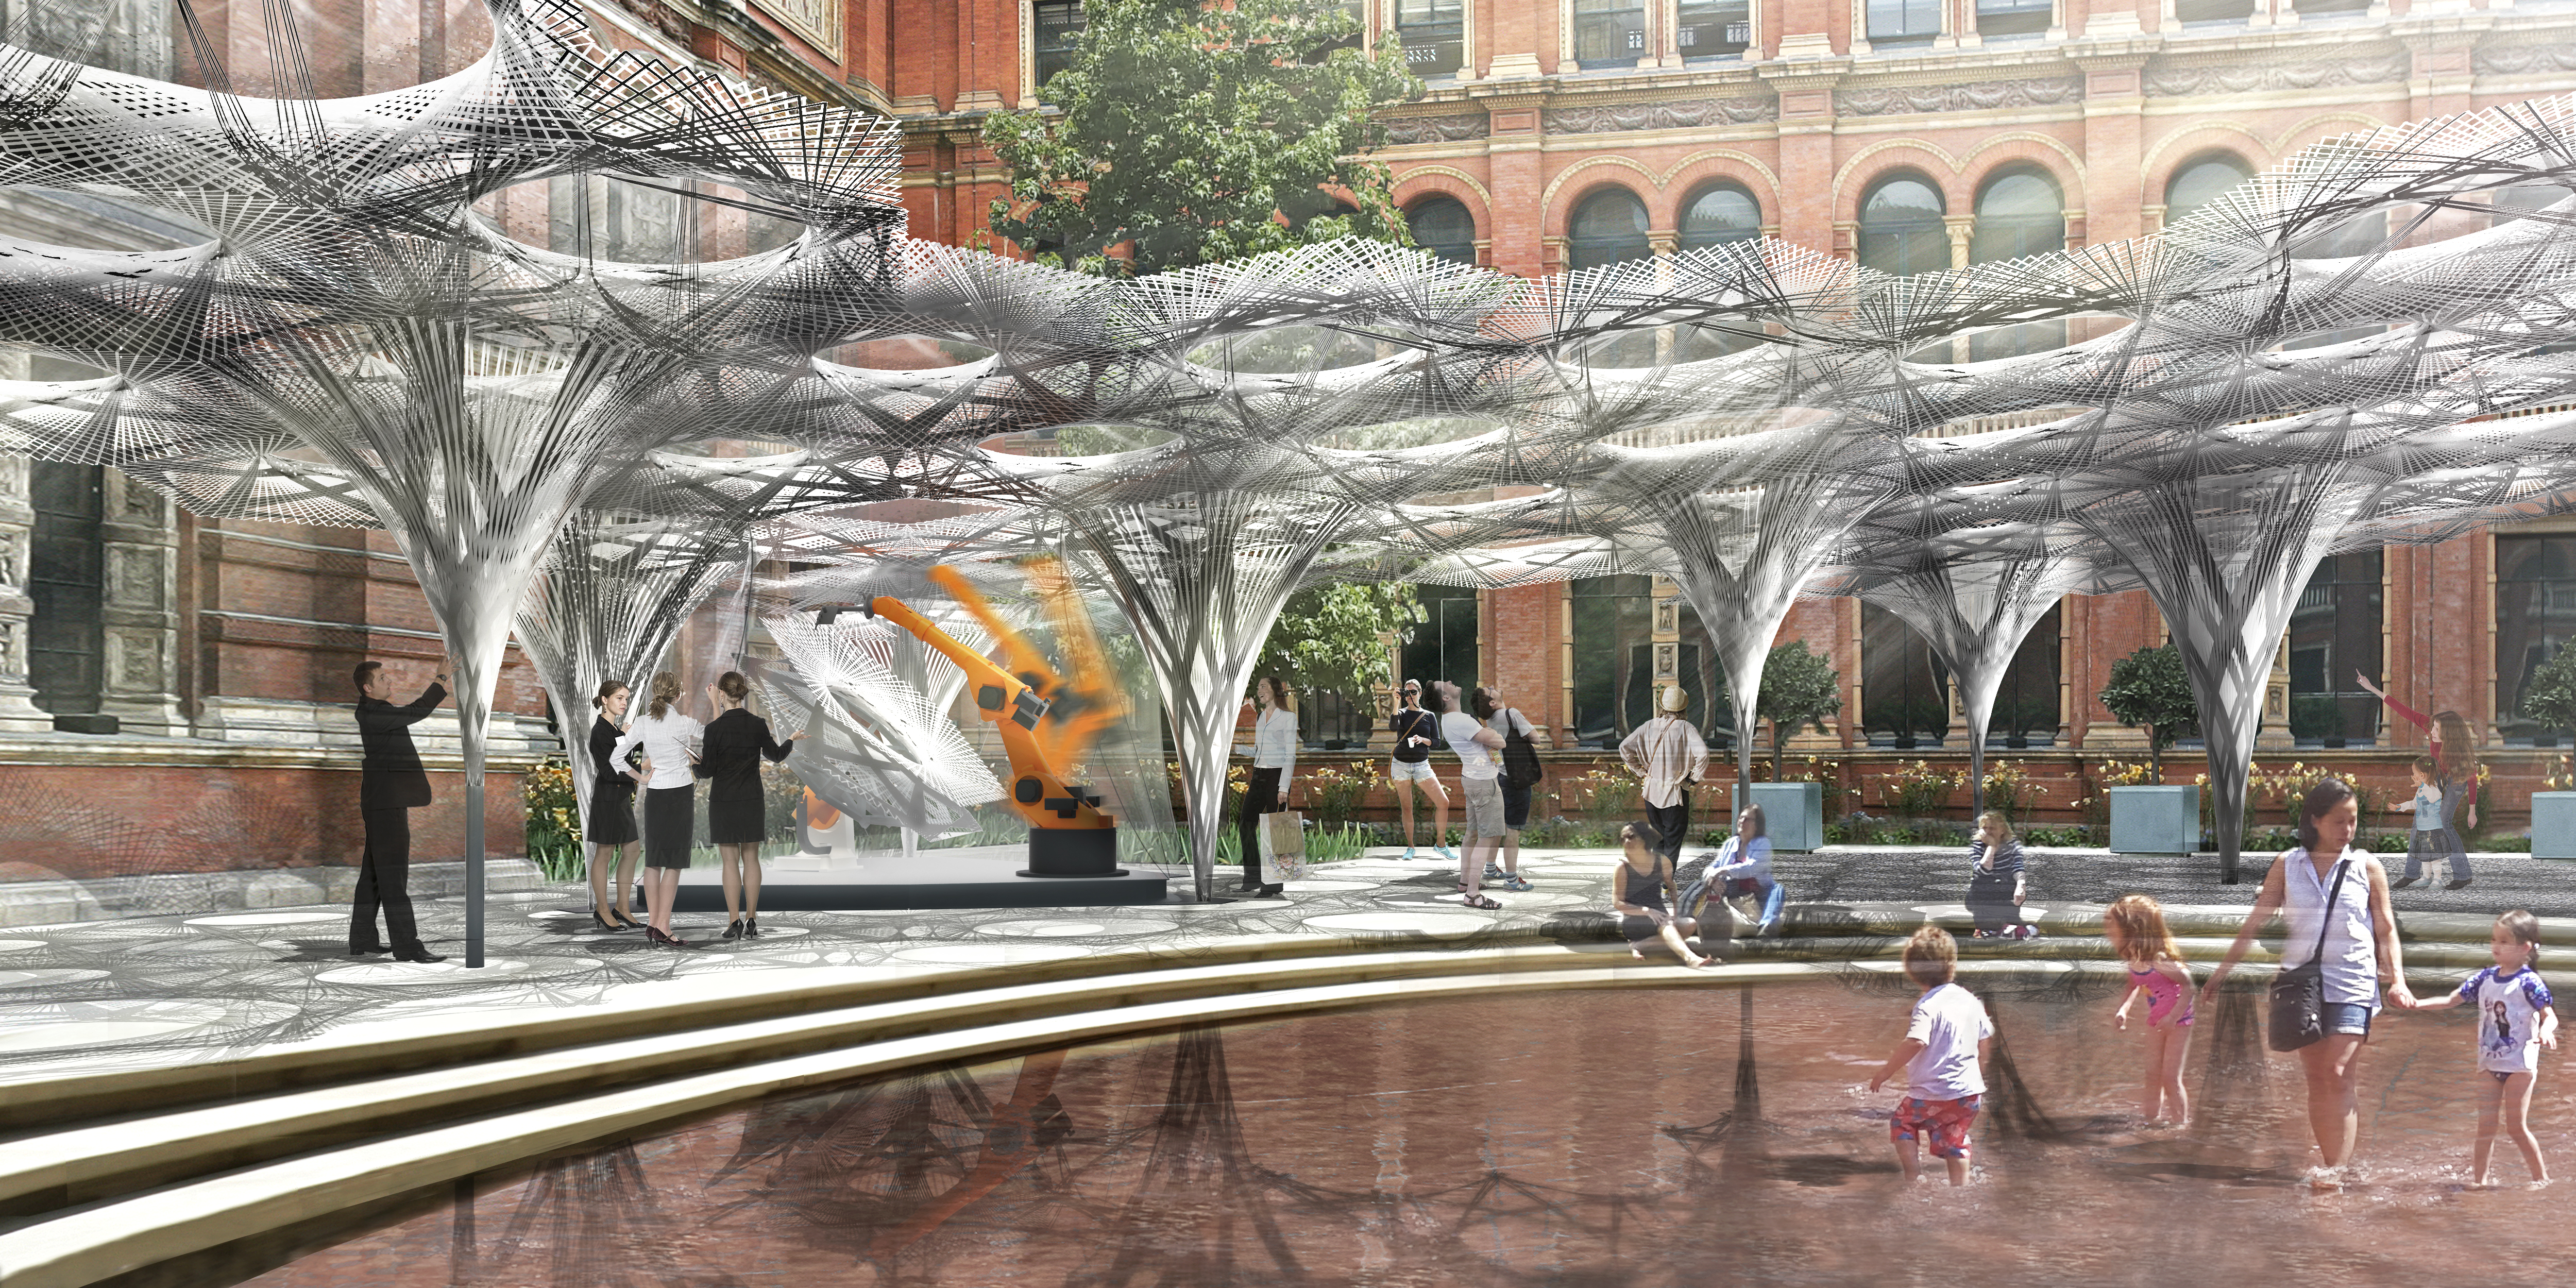 Elytra Filament Pavilion, render, V&A John Madejski Garden 2016  © ICDITKE University of Stuttgart (2)